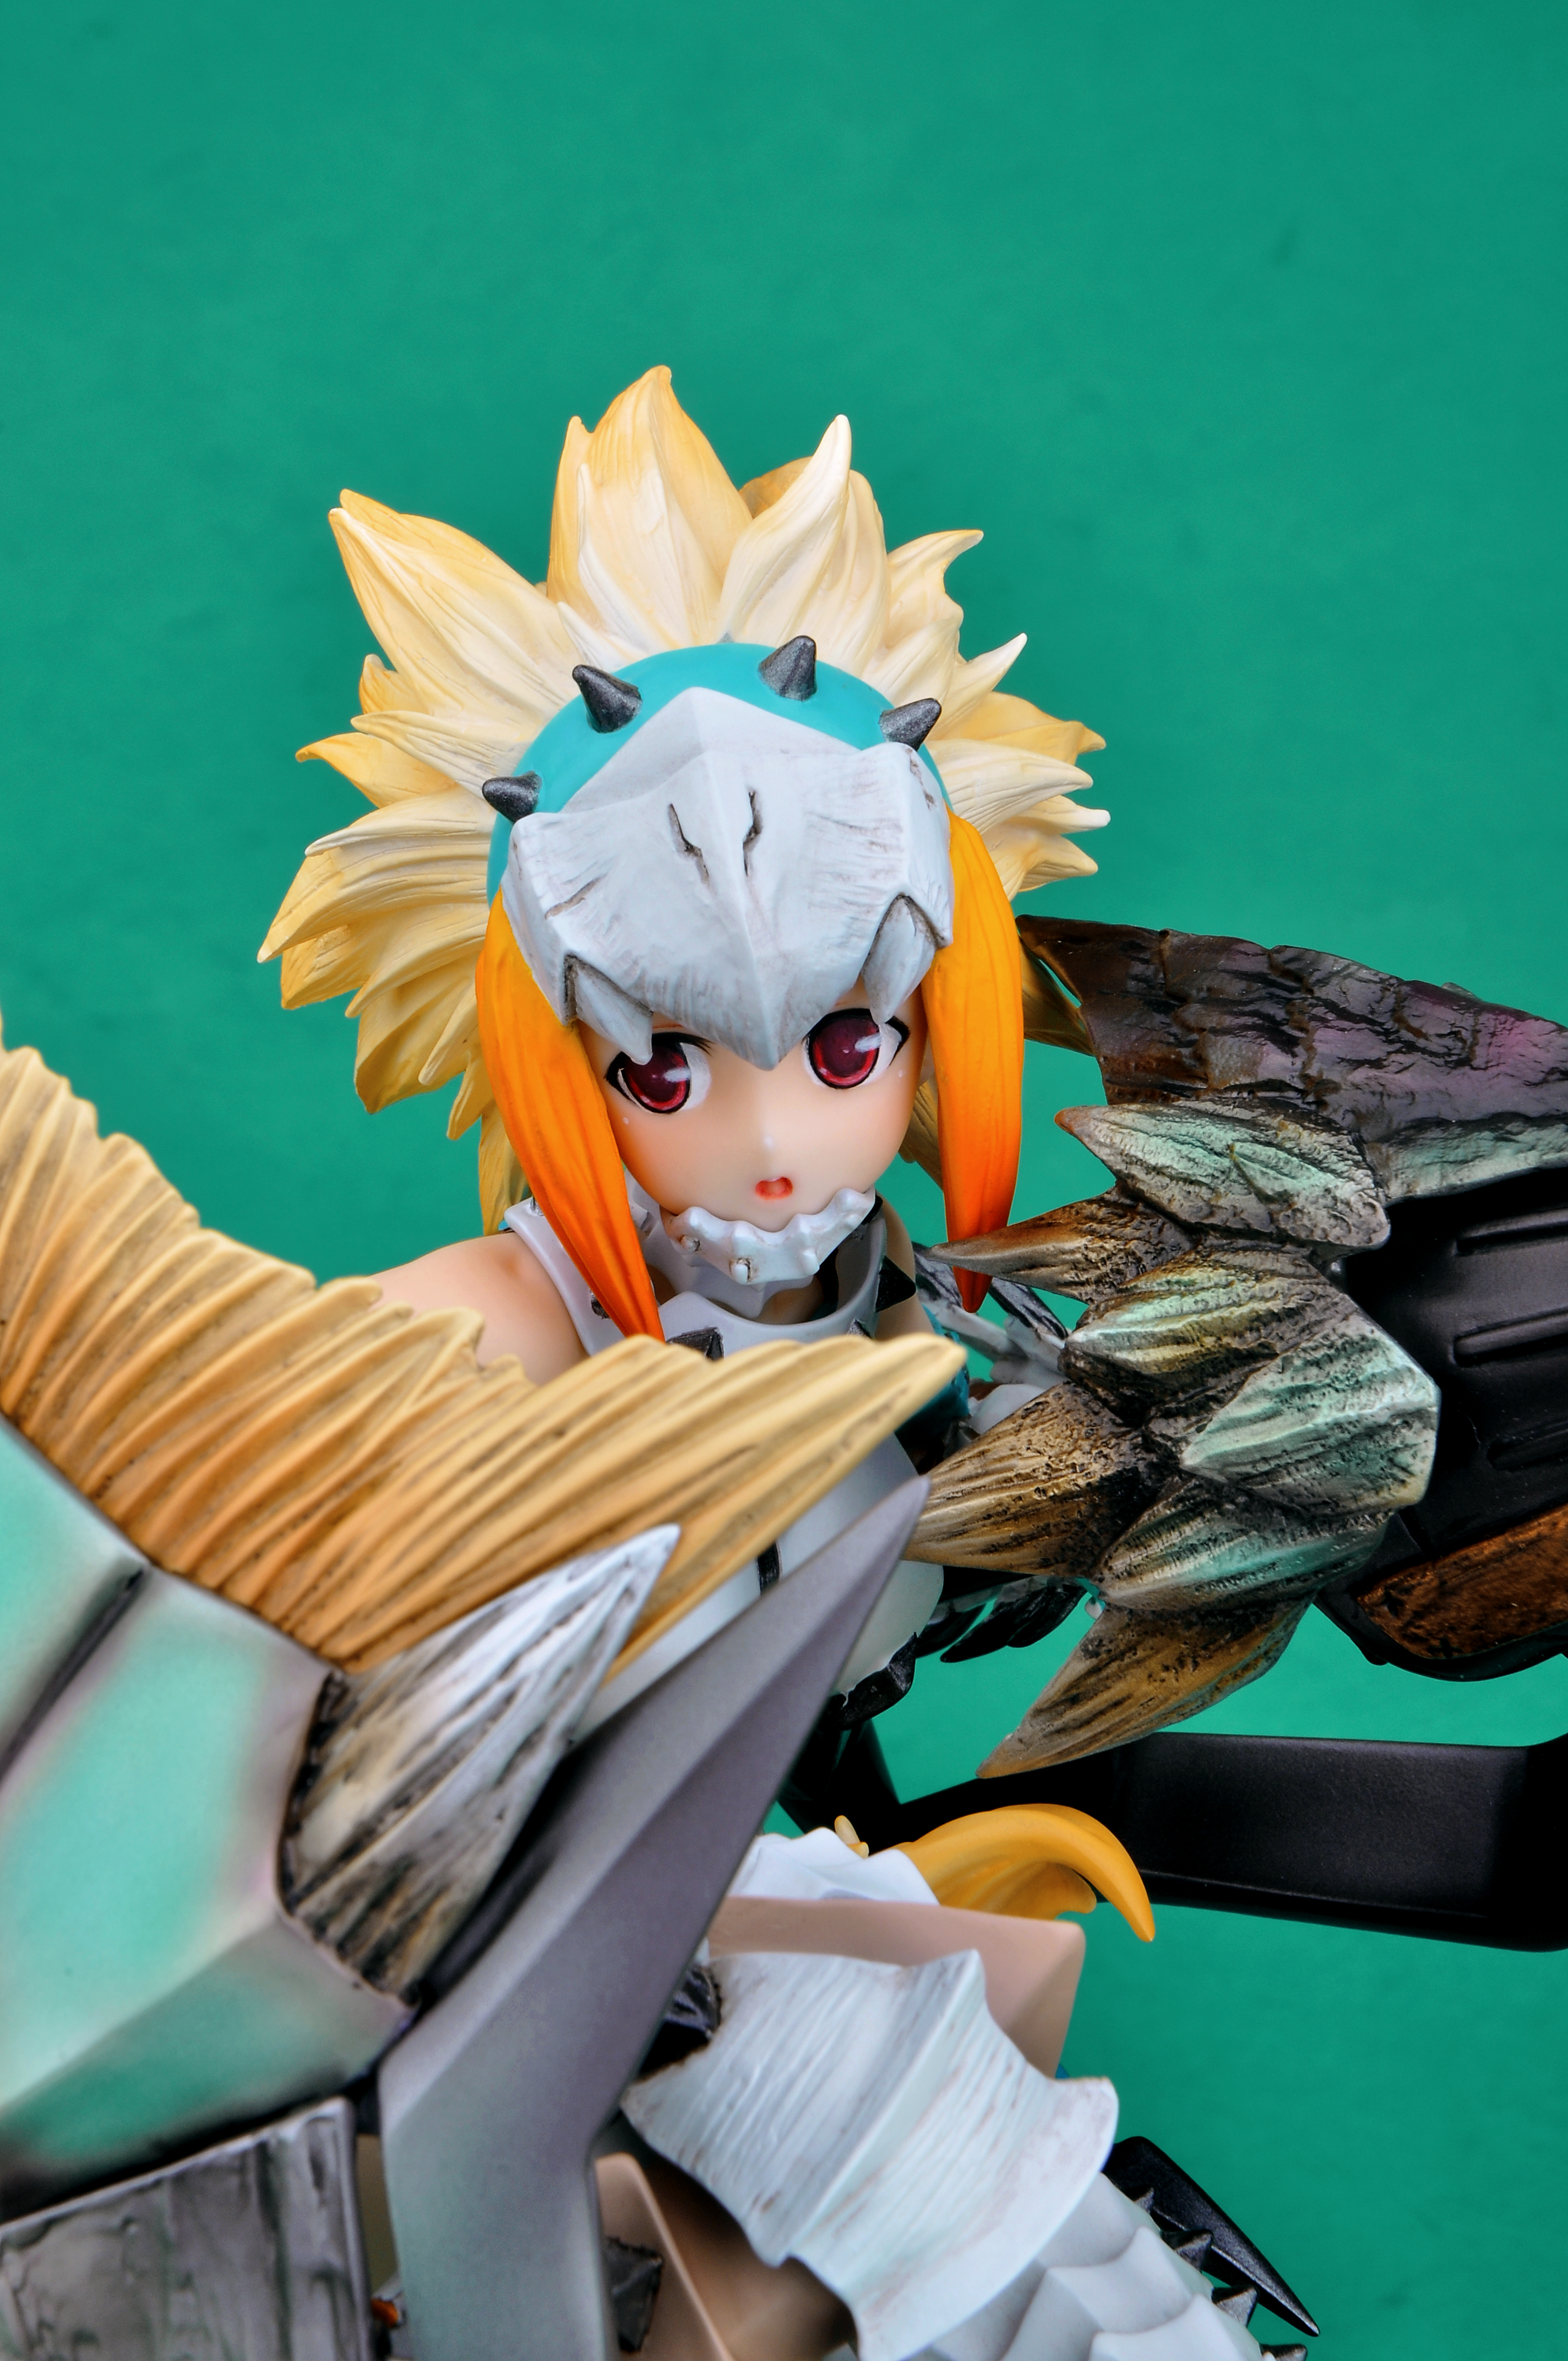 Berio Armor Hunter Monster Hunter prepainted figure haruhichan.com Monster Hunter video game figure 05